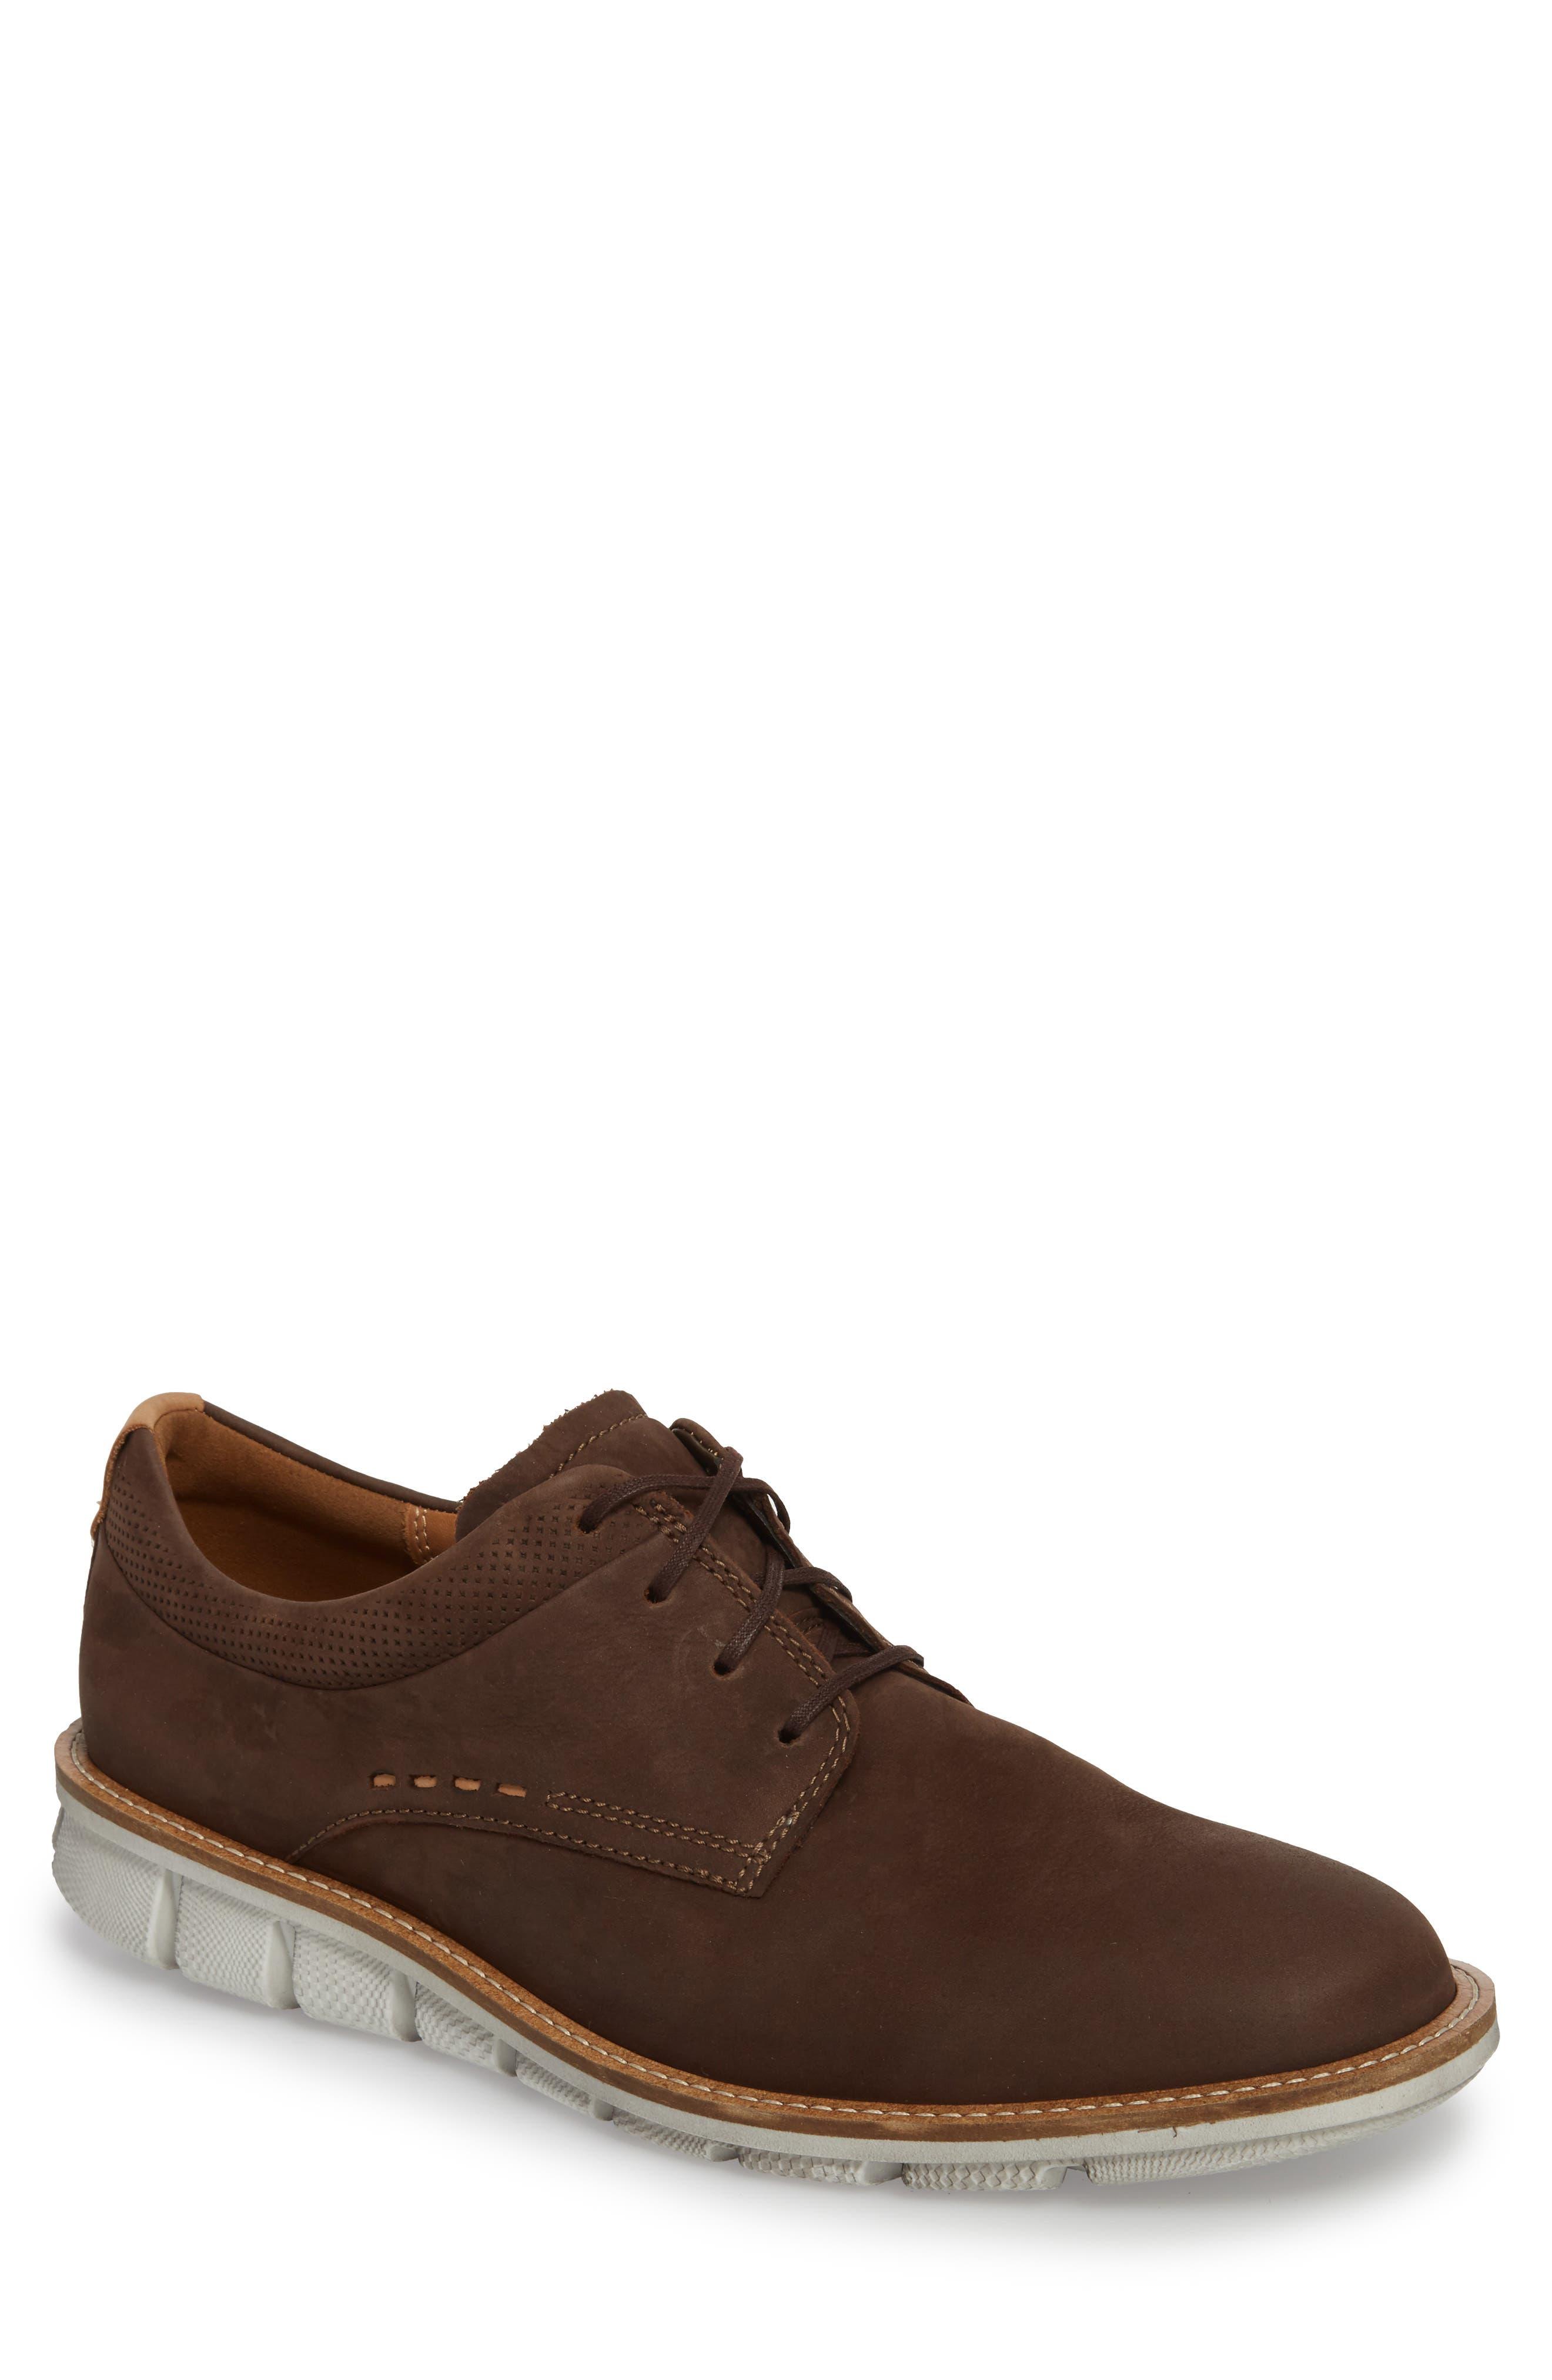 Jeremy Hybrid Plain Toe Derby,                         Main,                         color, Coffee Leather